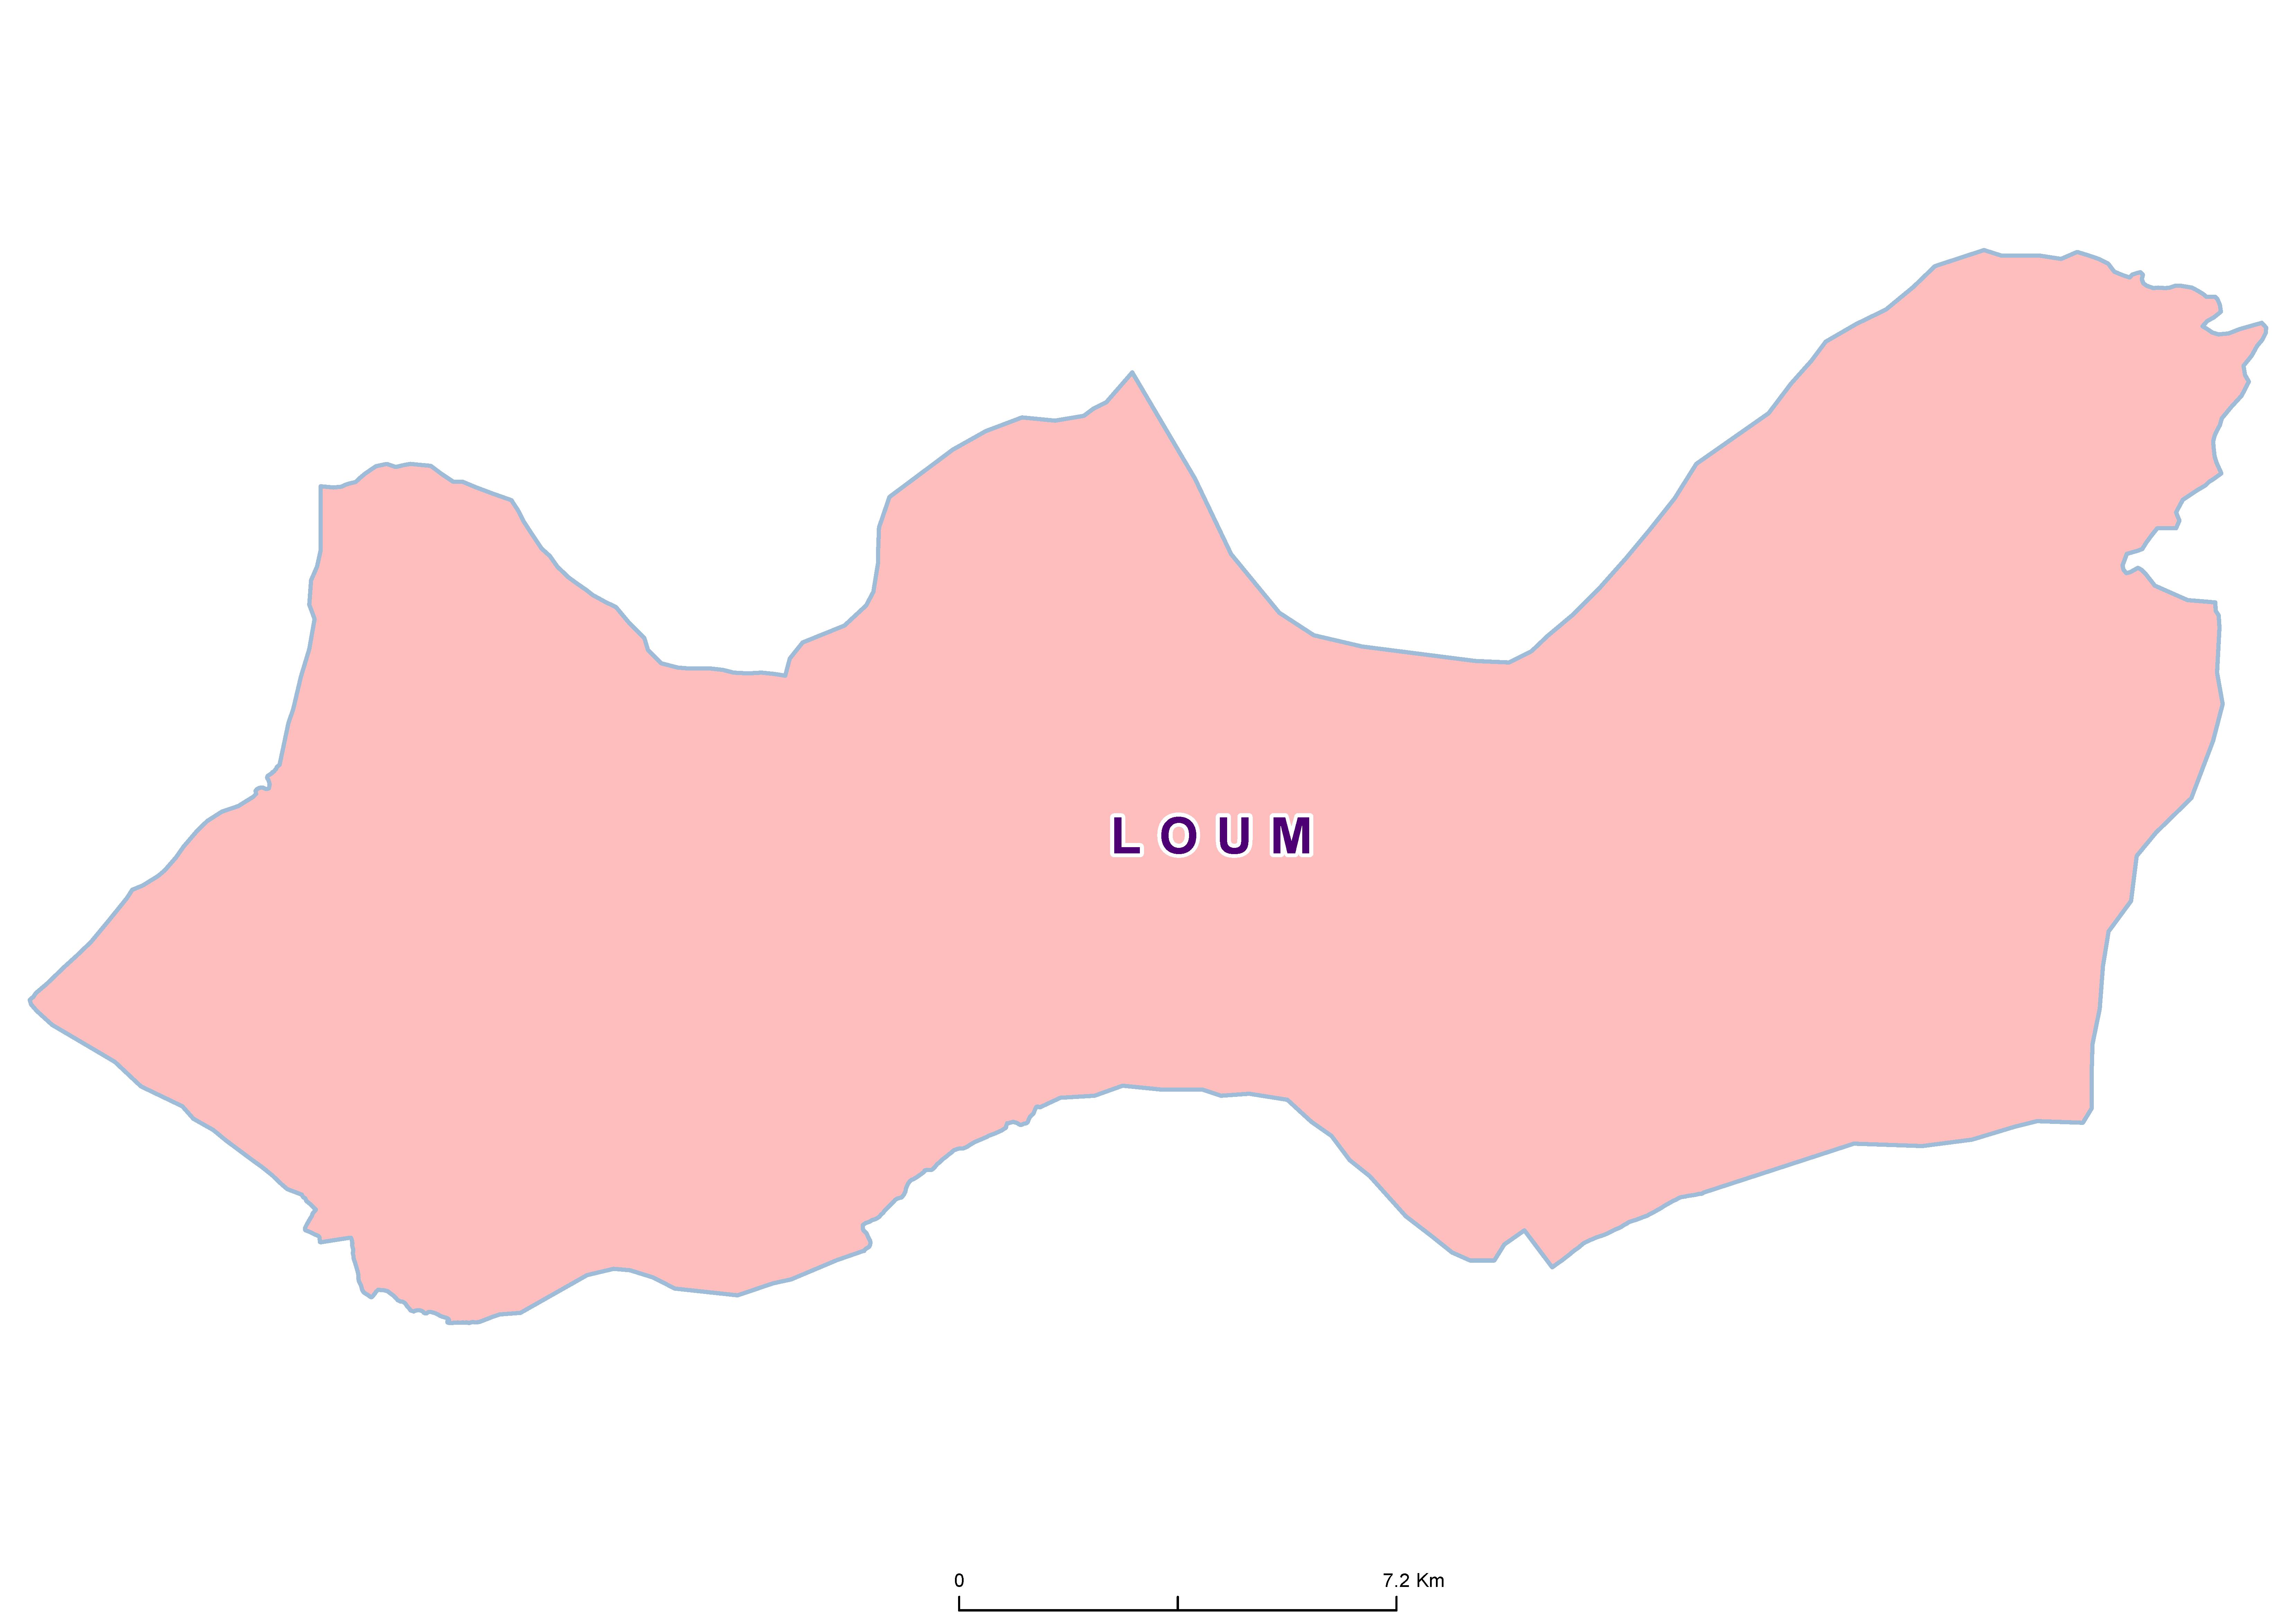 Loum Mean STH 20170001